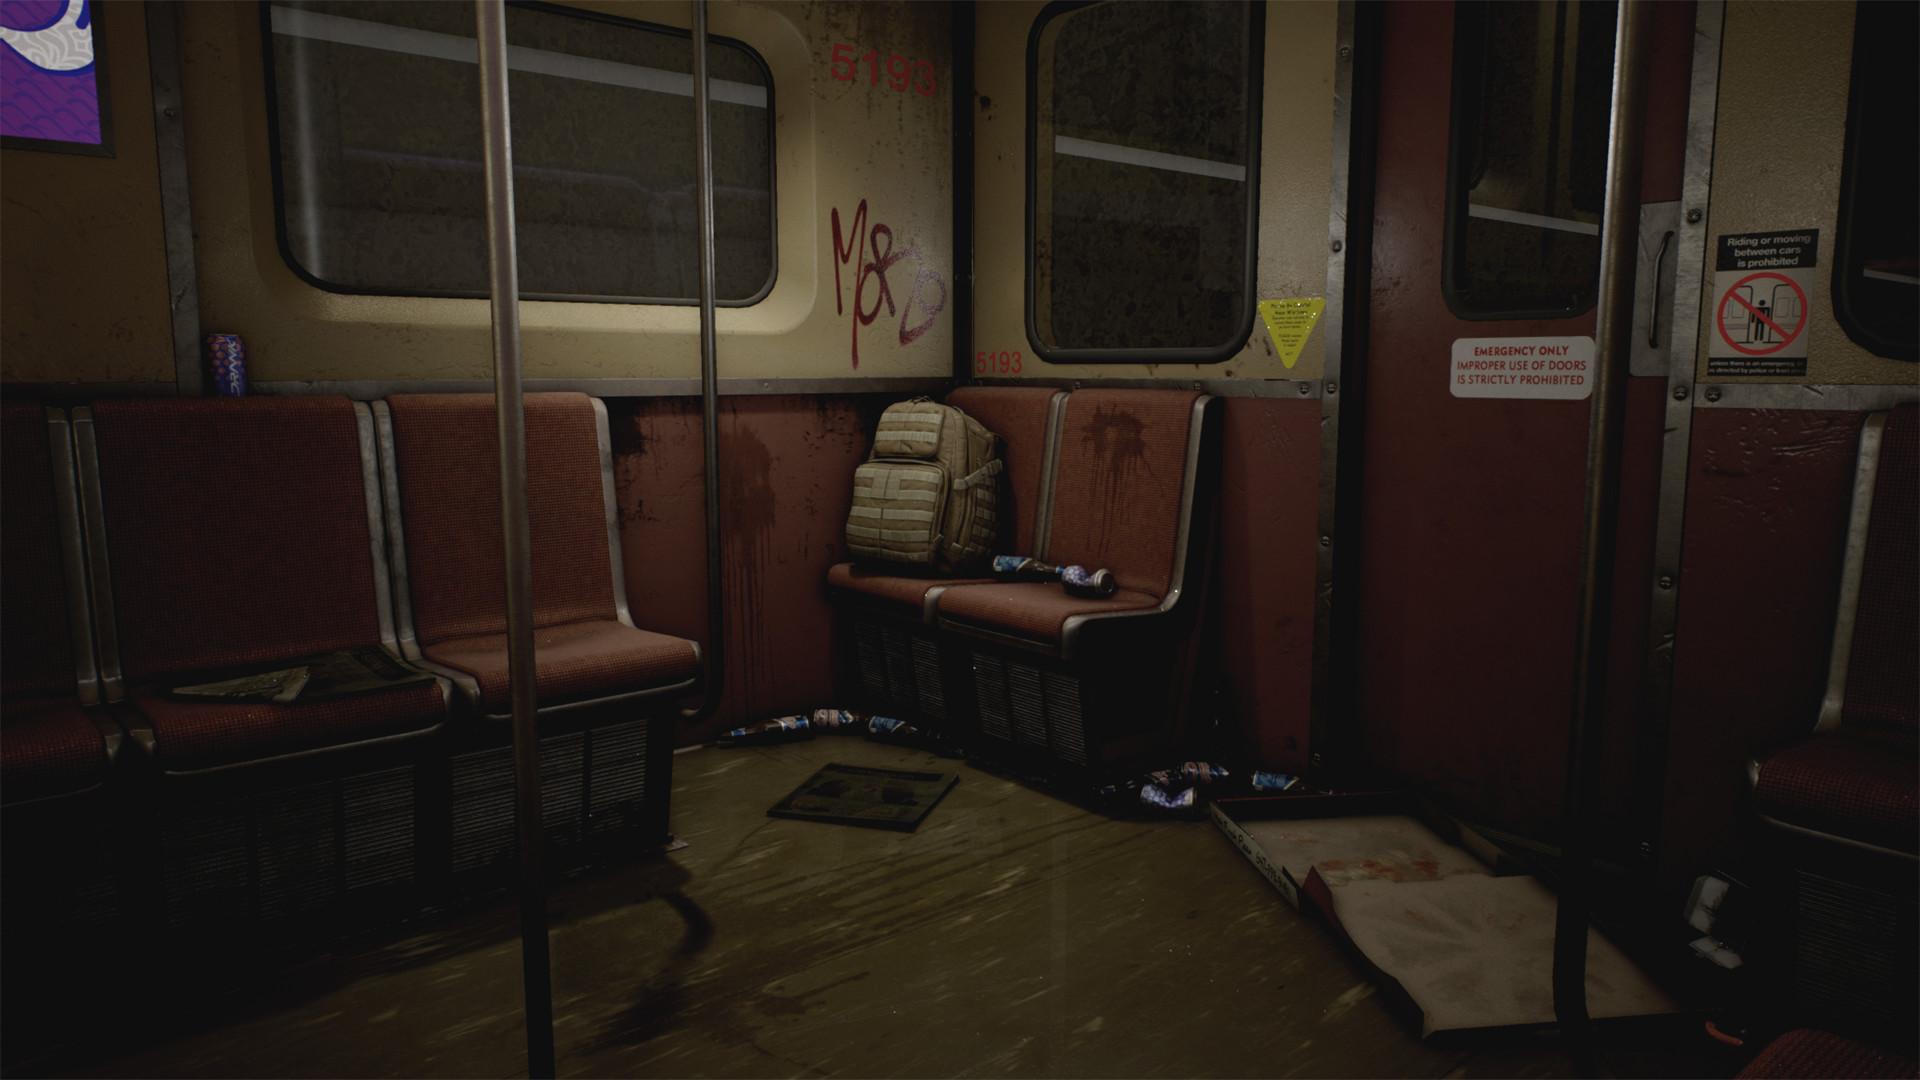 Kadir sheriff subway final 04